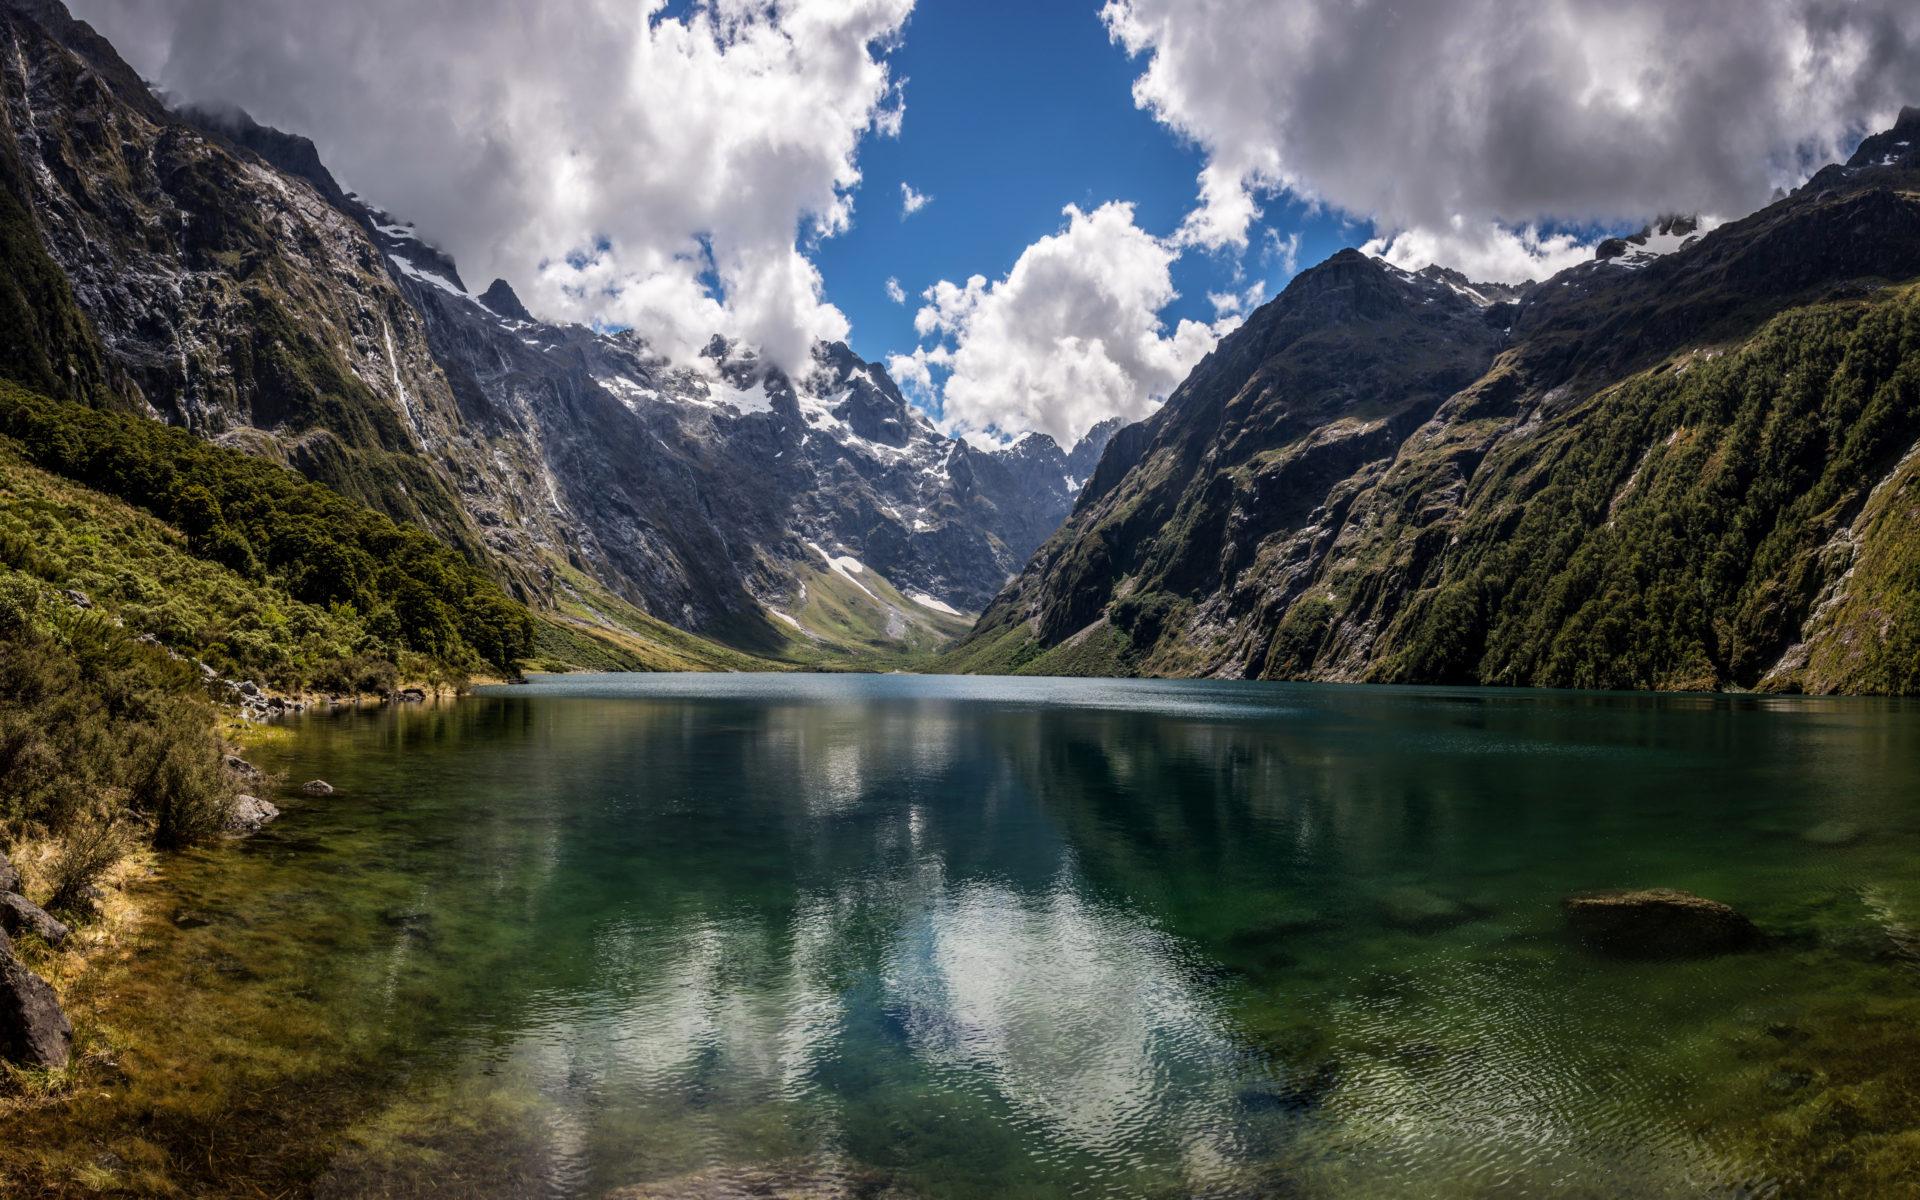 High Resolution Fall Wallpaper Natural Beauty Mountain Lake Marian New Zealand Hd